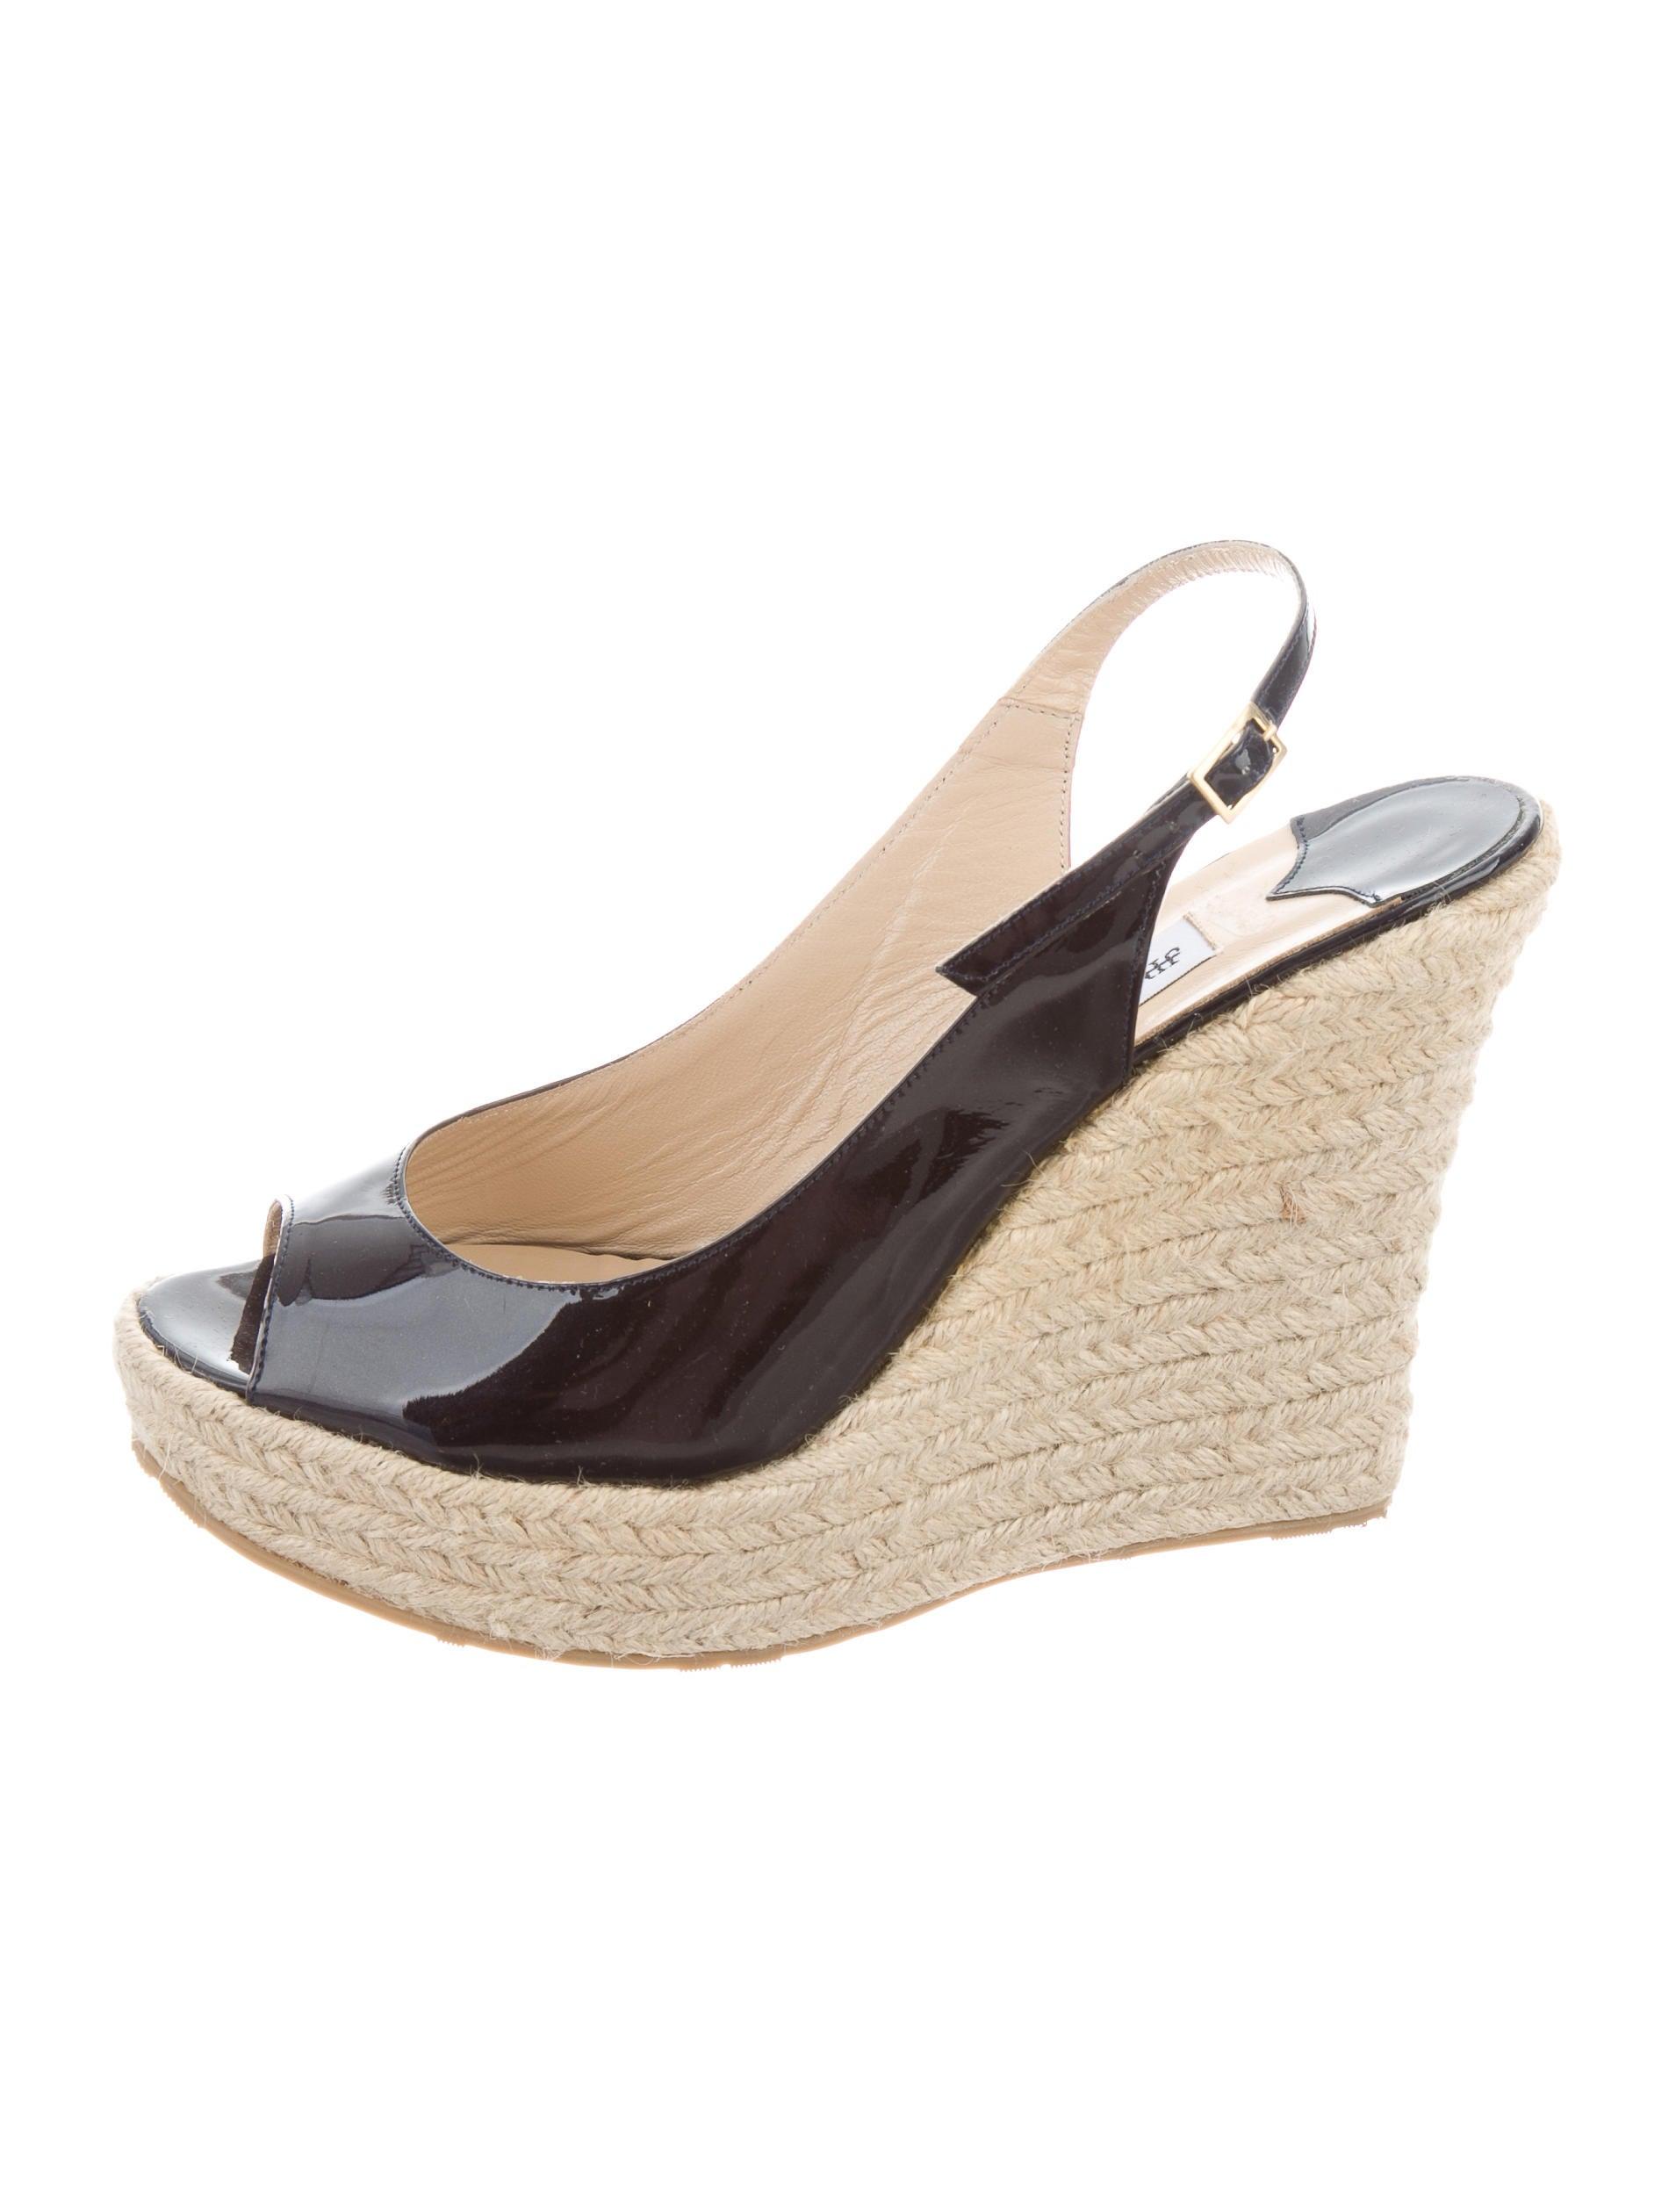 Jimmy Choo Platform Shoes On Sale